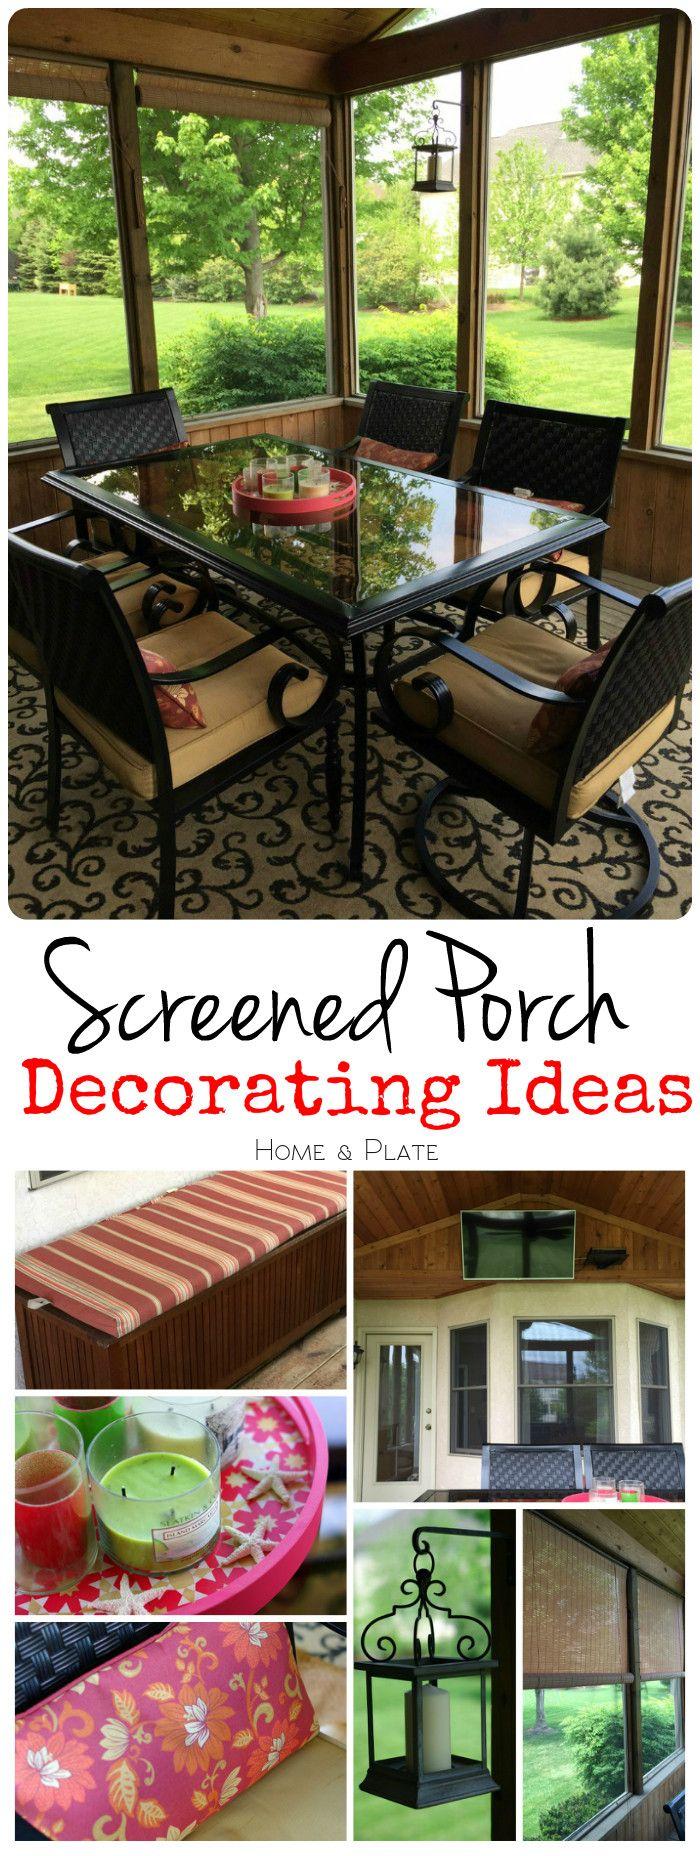 https://s-media-cache-ak0.pinimg.com/736x/ab/5a/b4/ab5ab4cfc00255f7e21be241547207d5--florida-decorating-ideas-backporch-decorating-ideas.jpg